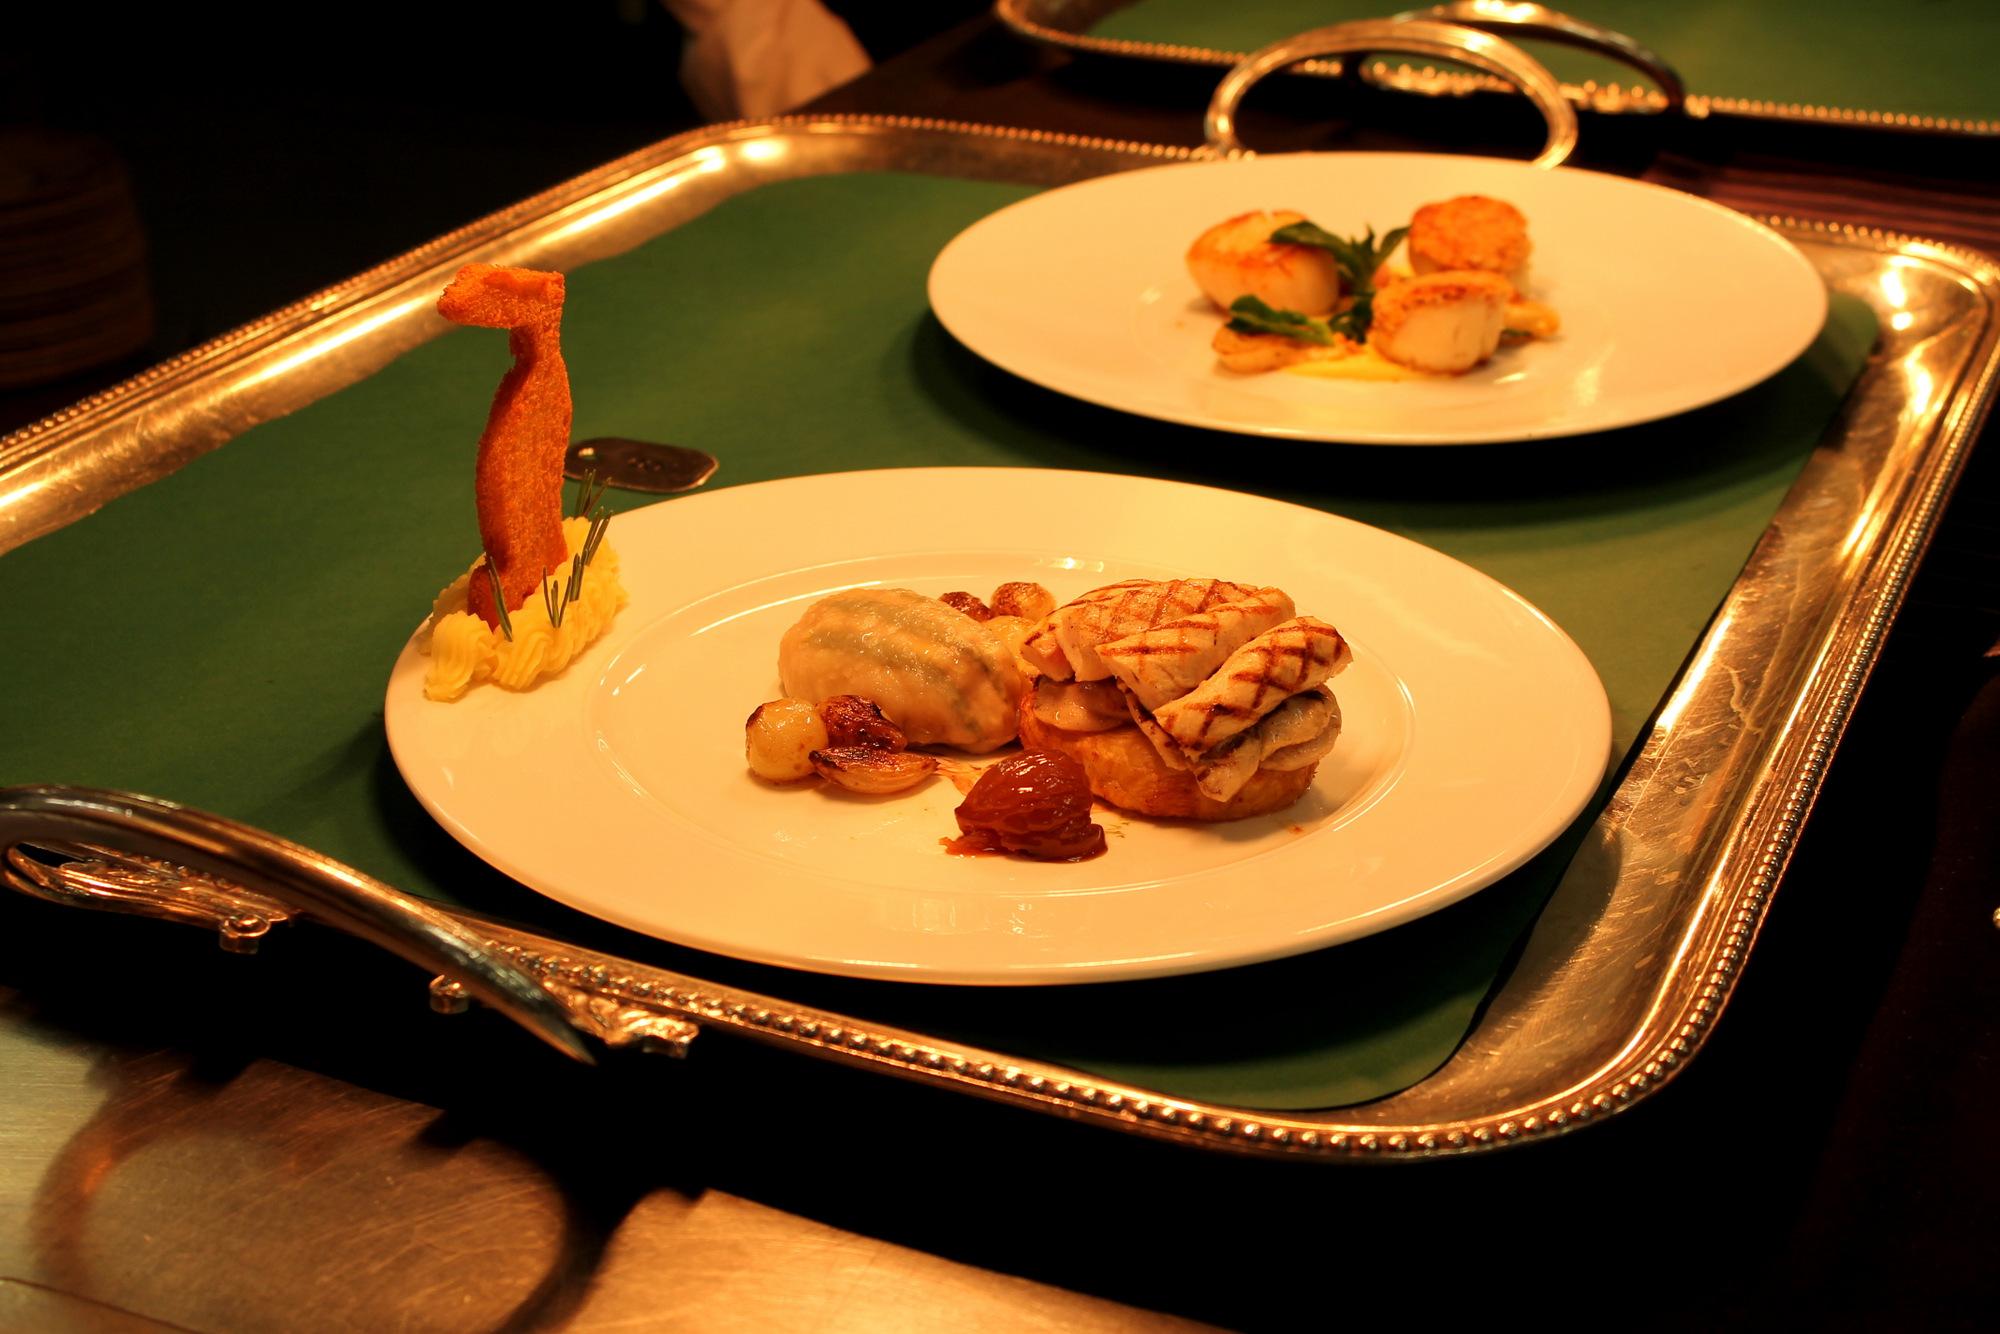 Grilled tender rabbit fillets, celeriac fondant, glazed chestnuts and Armagnac sauce.